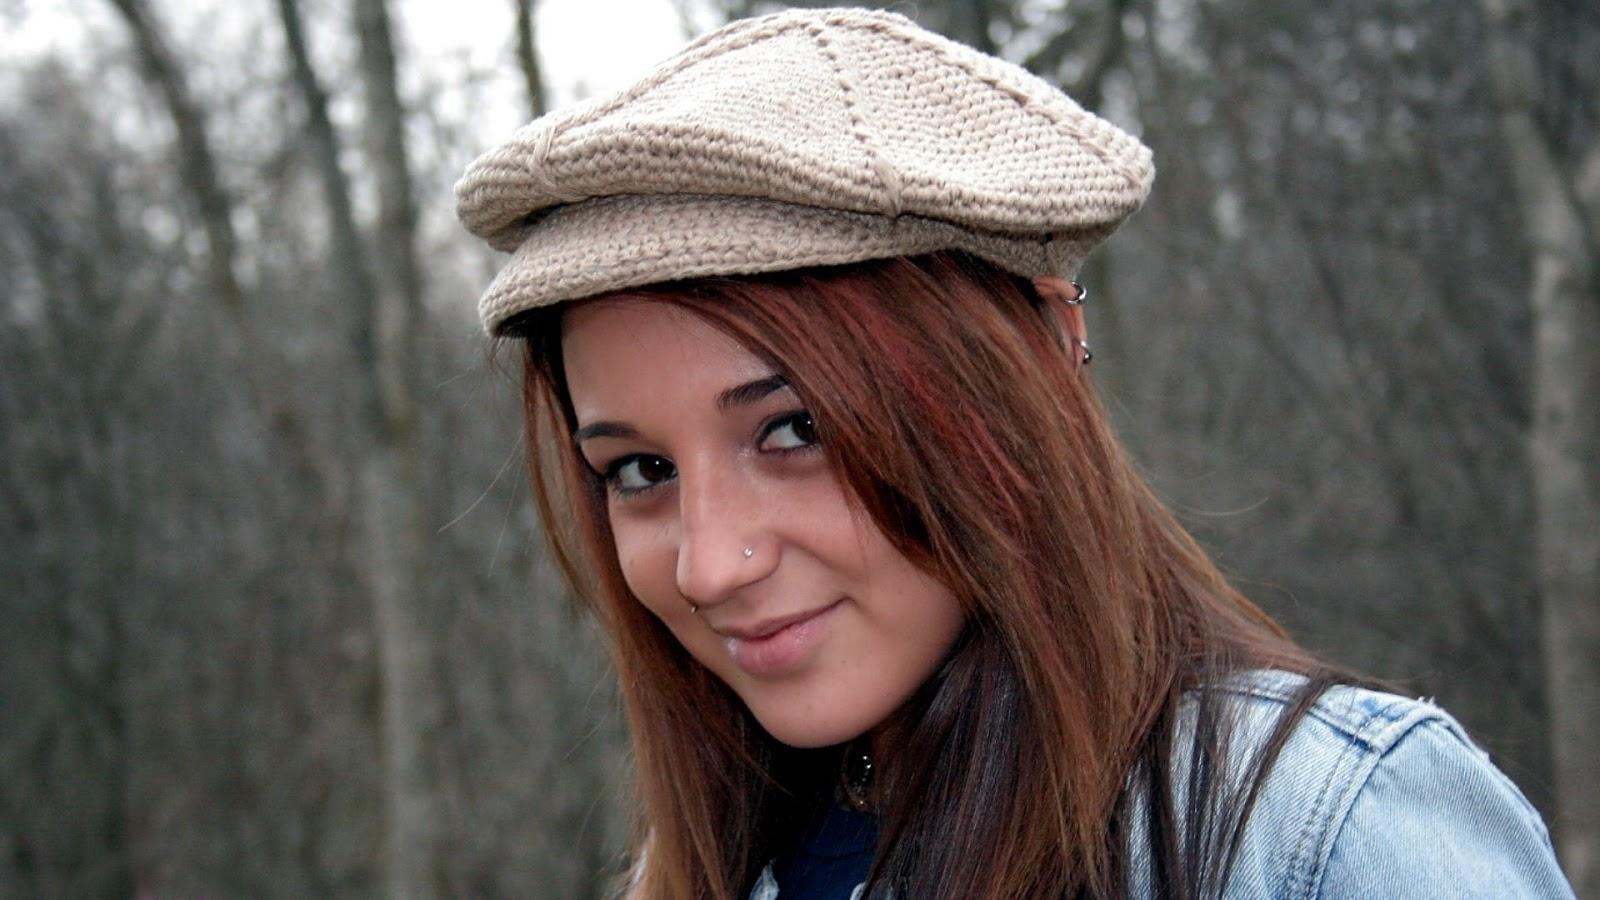 H <b>Nikki Sims</b> φωτογραφίζεται στο μπάνιο της και προκαλεί εγκεφαλικά! - sims-nature-nikki-251912